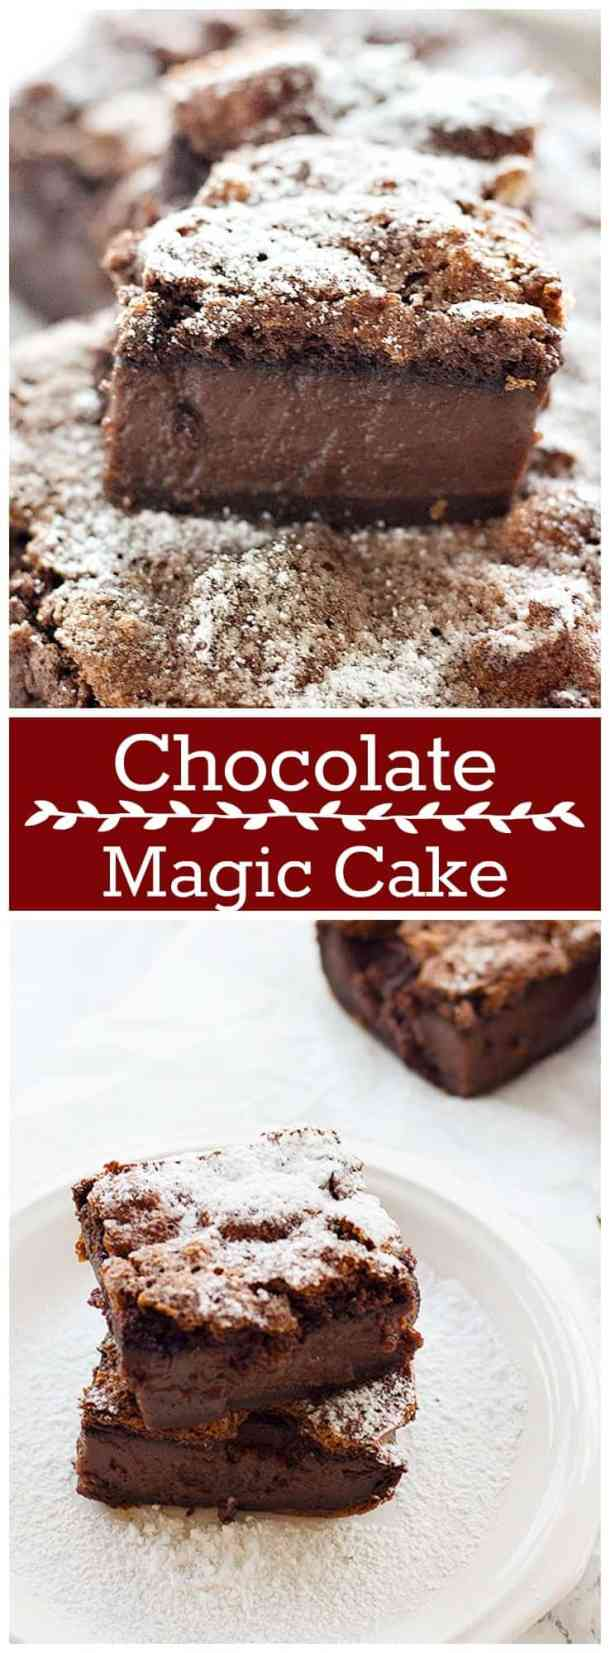 Chocolate Magic Cake | Chocolate Magic Custard Cake | Chocolate Magic Cake Recipe | Magic Chocolate Custard Cake